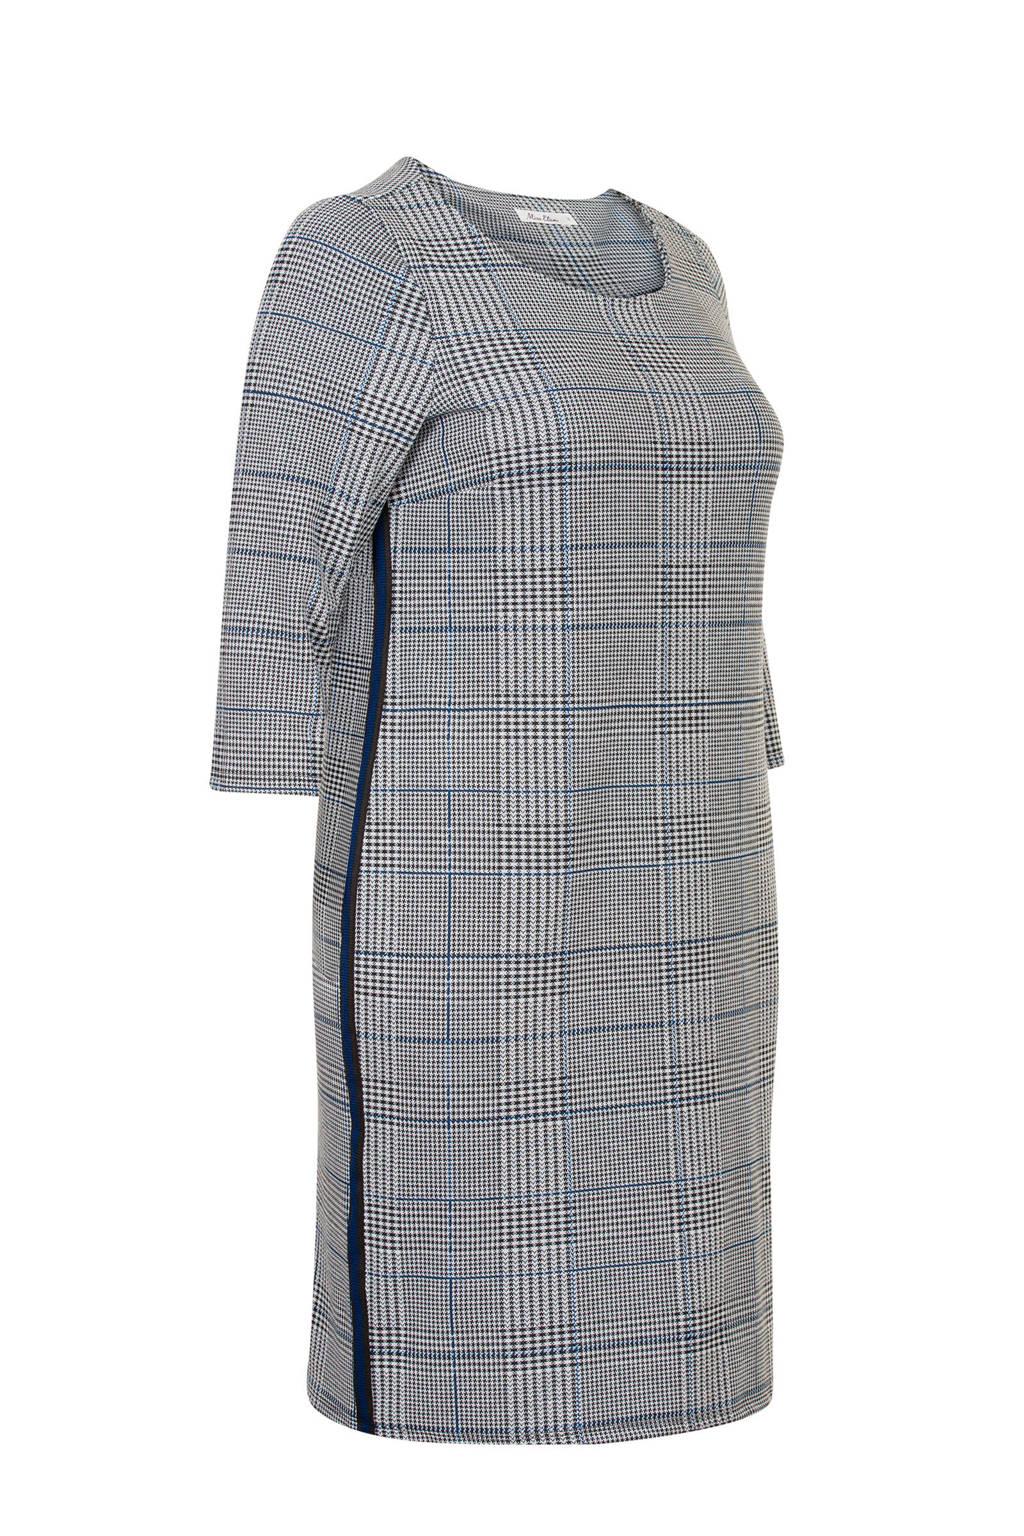 Miss Etam Plus geruite jurk, Zwart